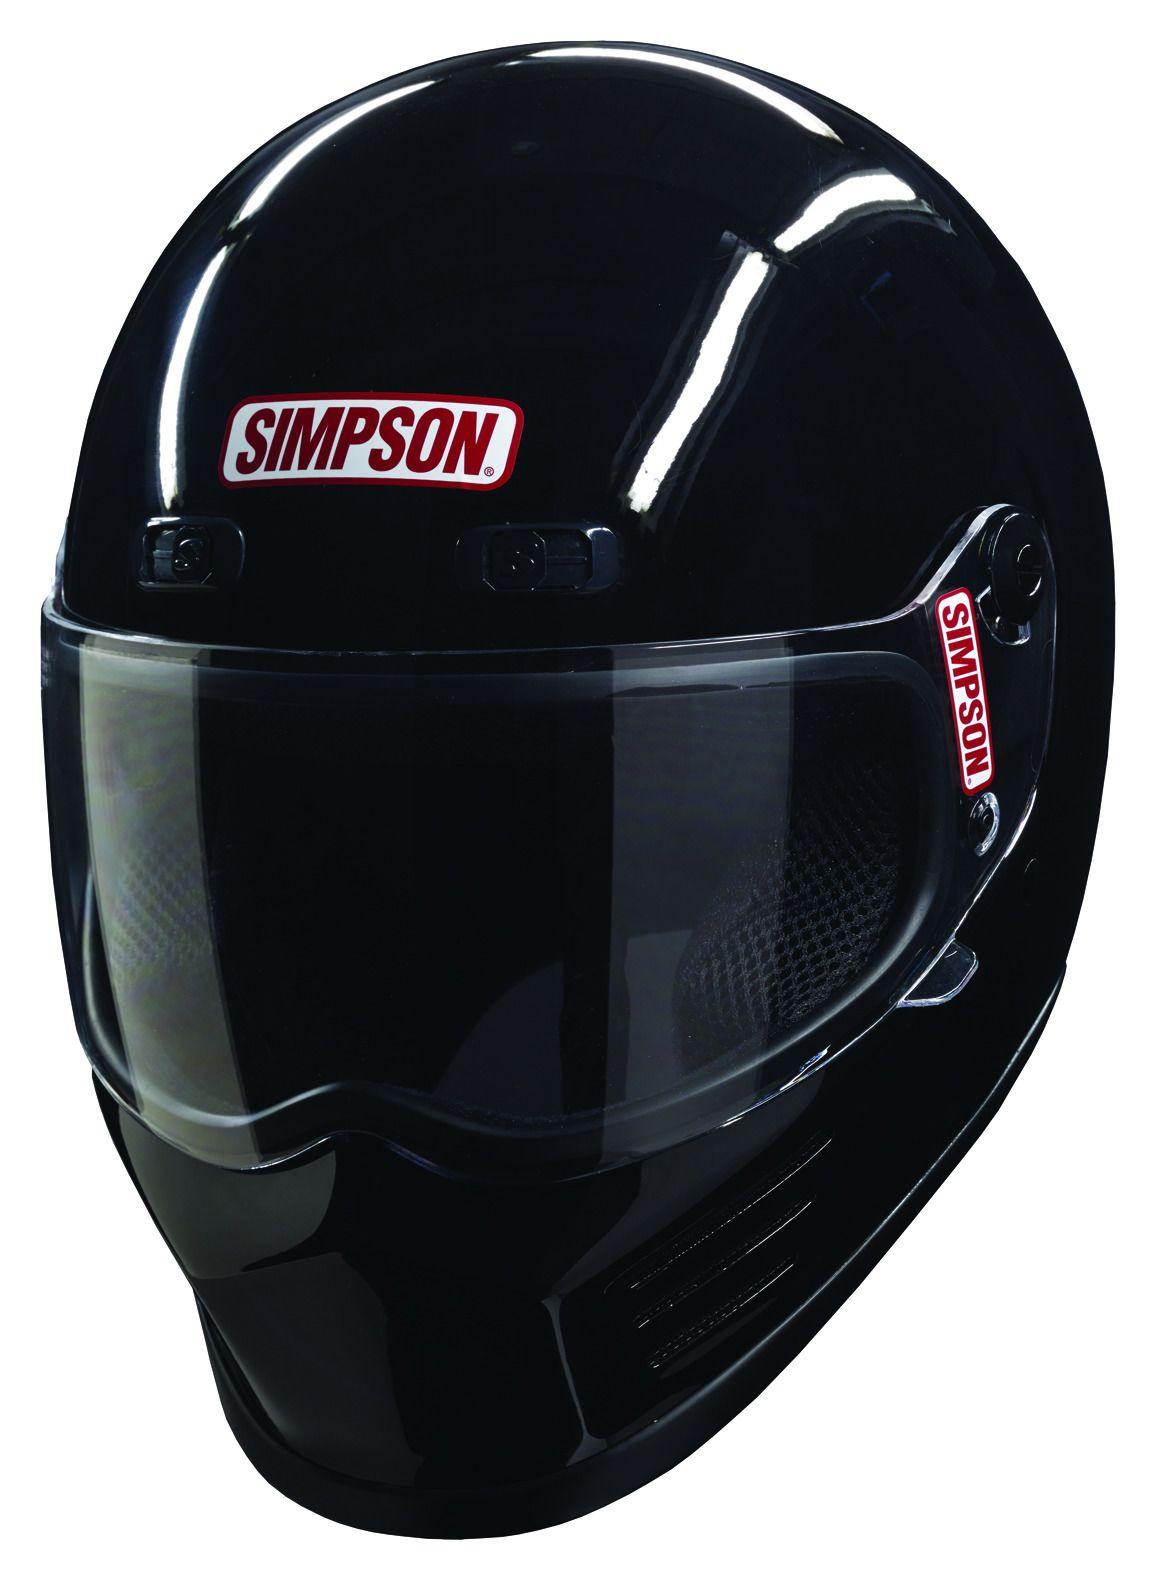 Simpson Street Bandit Helmet Snell M2010 RevZilla : simpsonstreetbandithelmet <strong>Bandit Style</strong> Helmet from www.revzilla.com size 1160 x 1584 jpeg 106kB